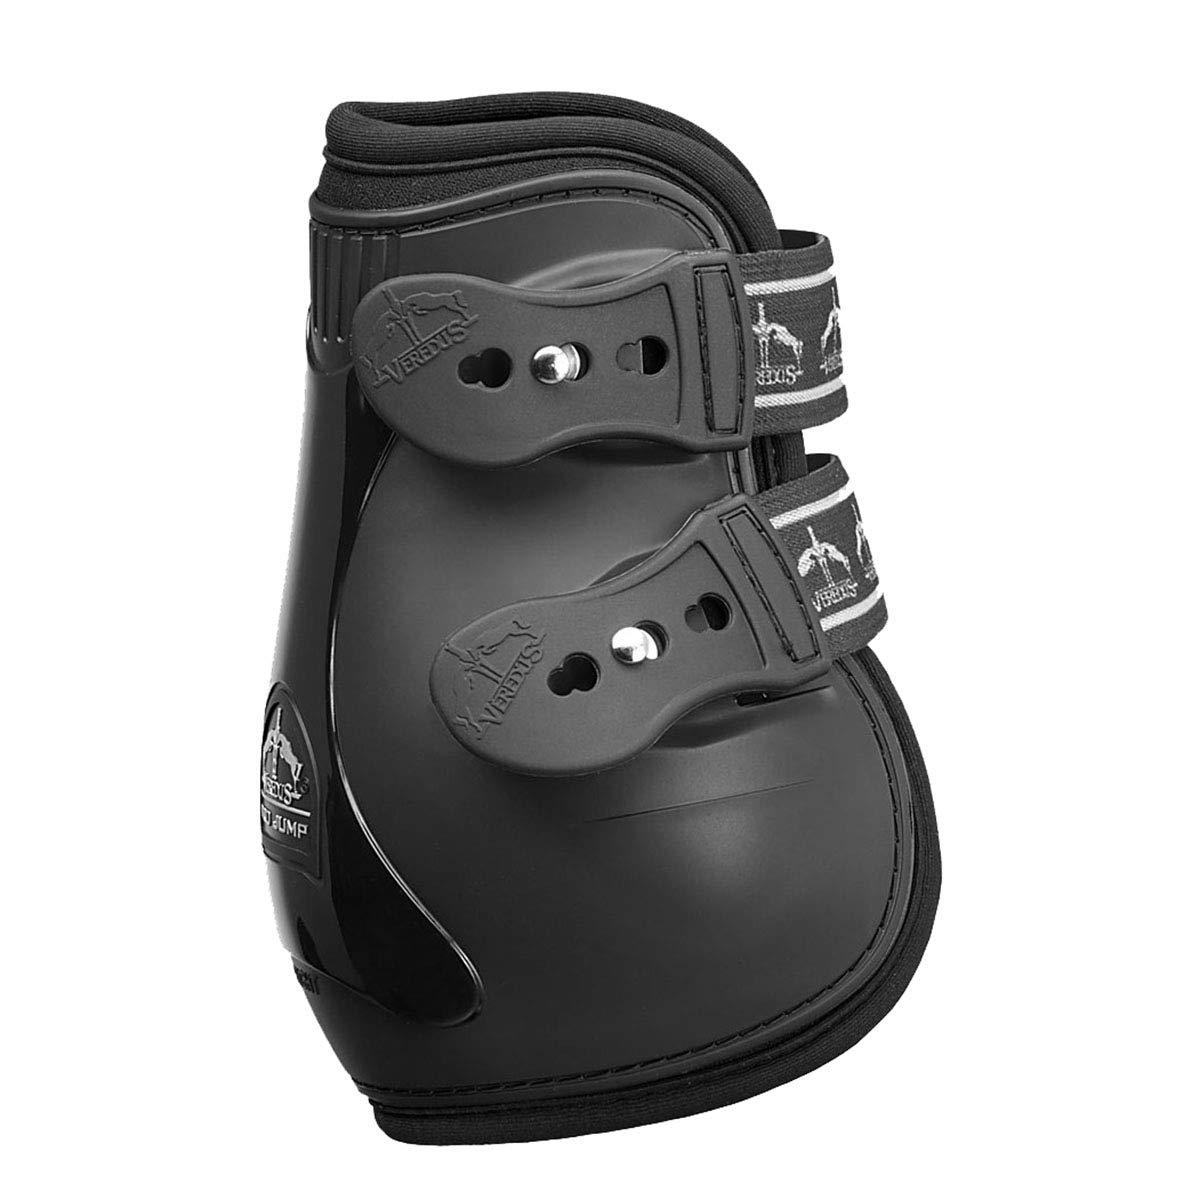 Veredus - Fetlock Pro Jump Vento Elastic - Horse Boots - Made in Italy - Black